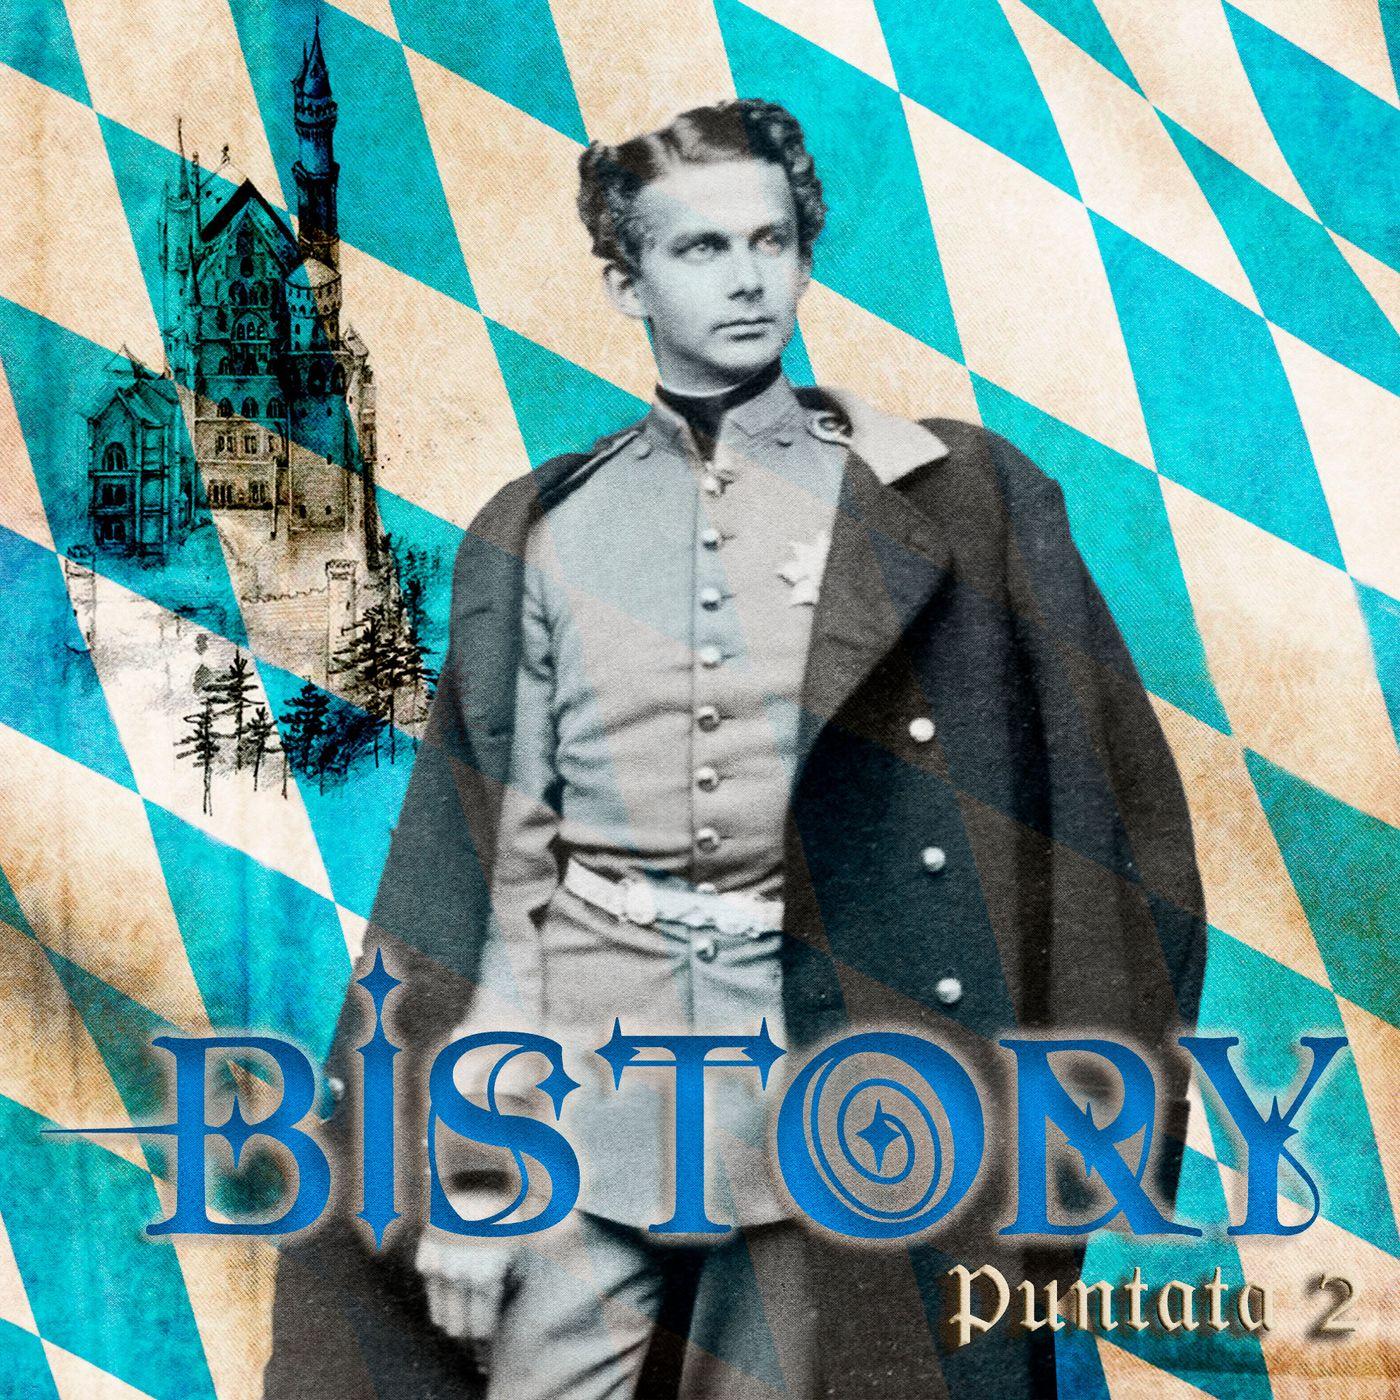 Bistory S01E02 Ludwig di Baviera